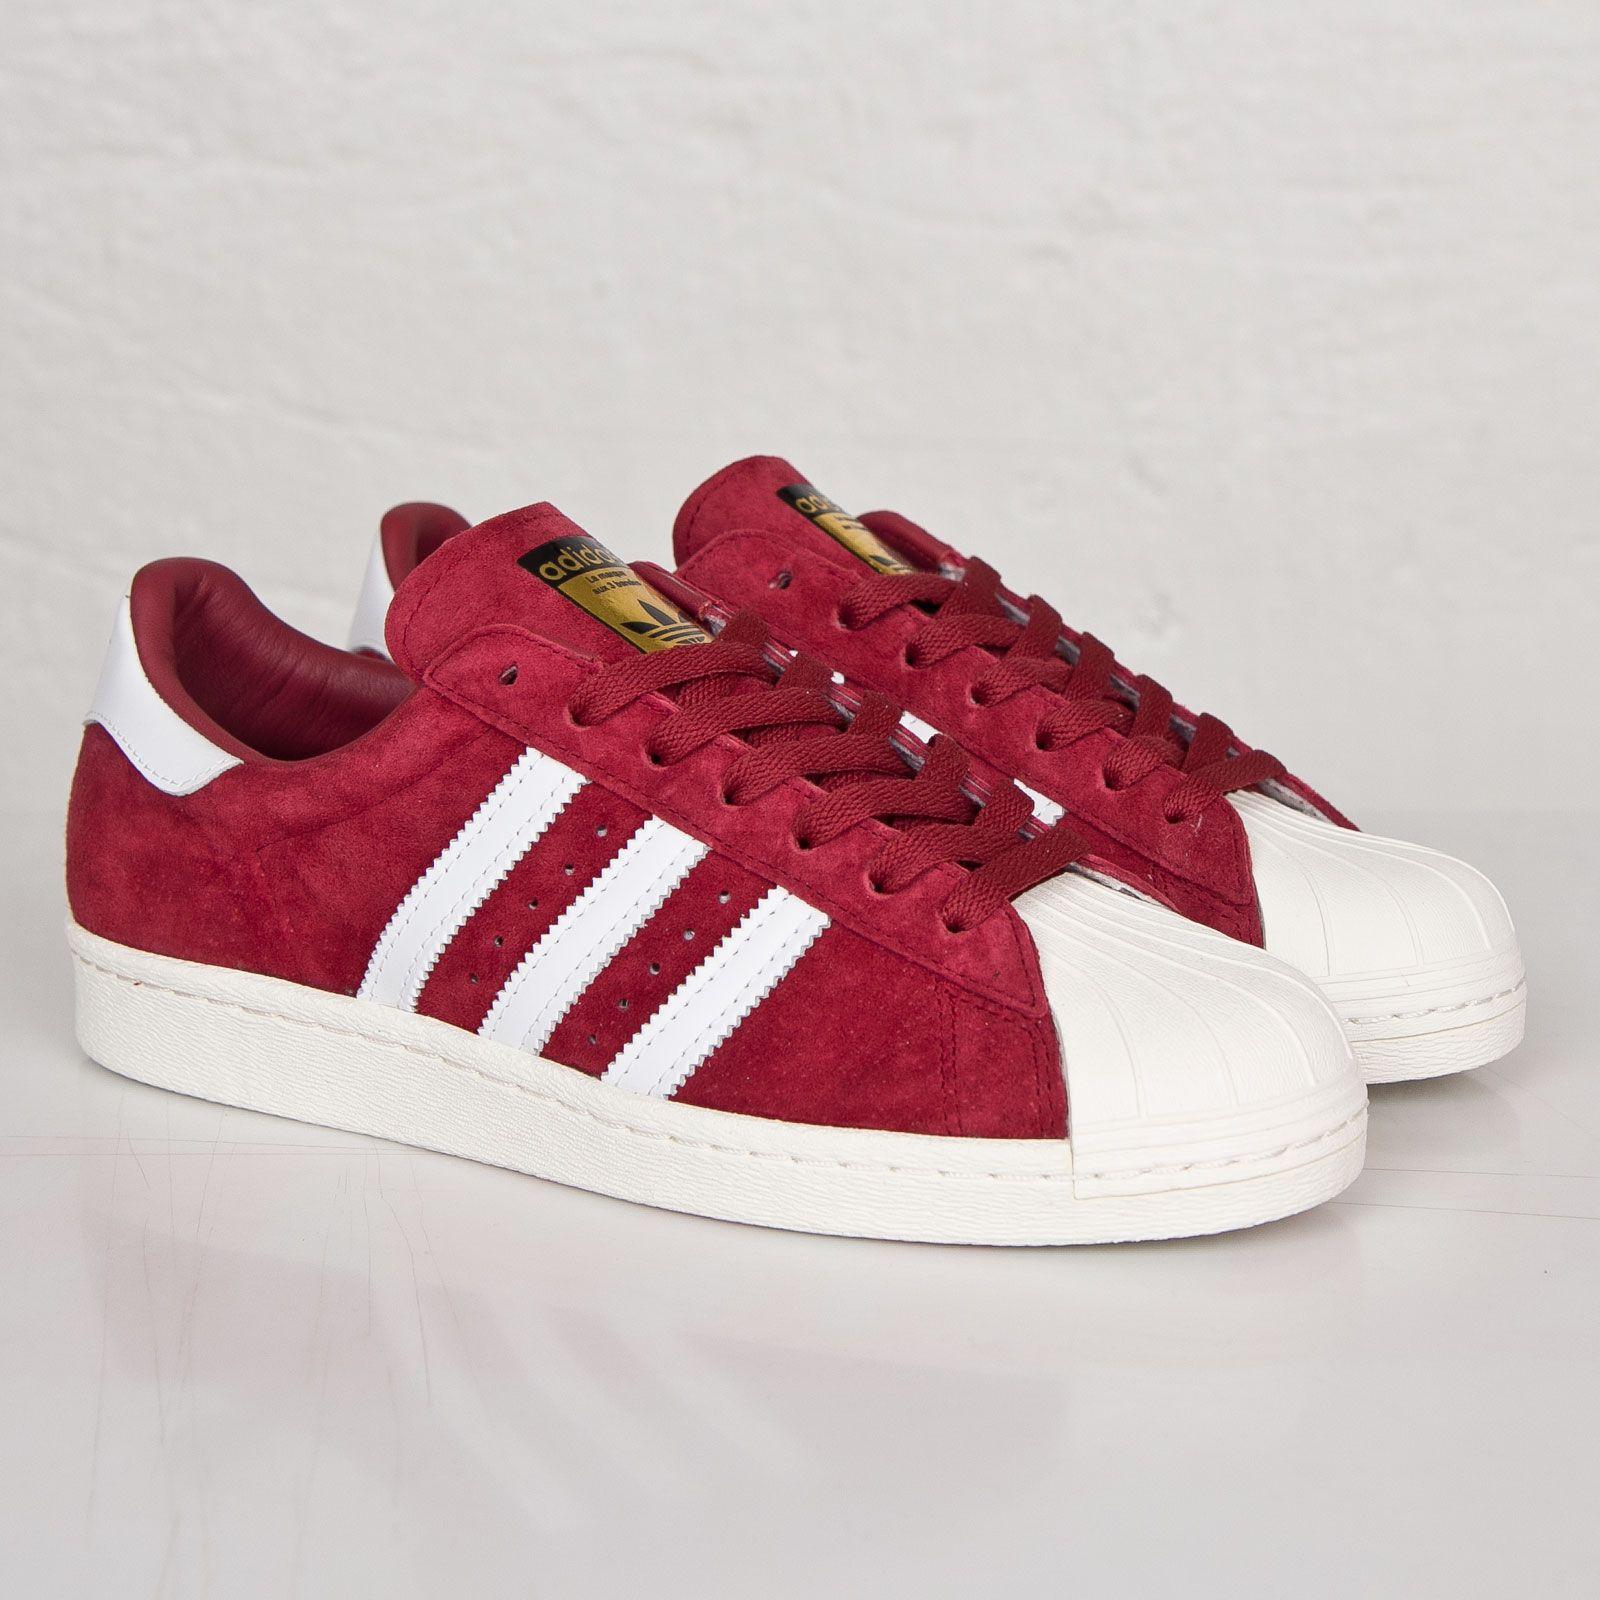 Adidas Superstar 80s Deluxe Suede     Footwear   Pinterest     Adidas 0cb343